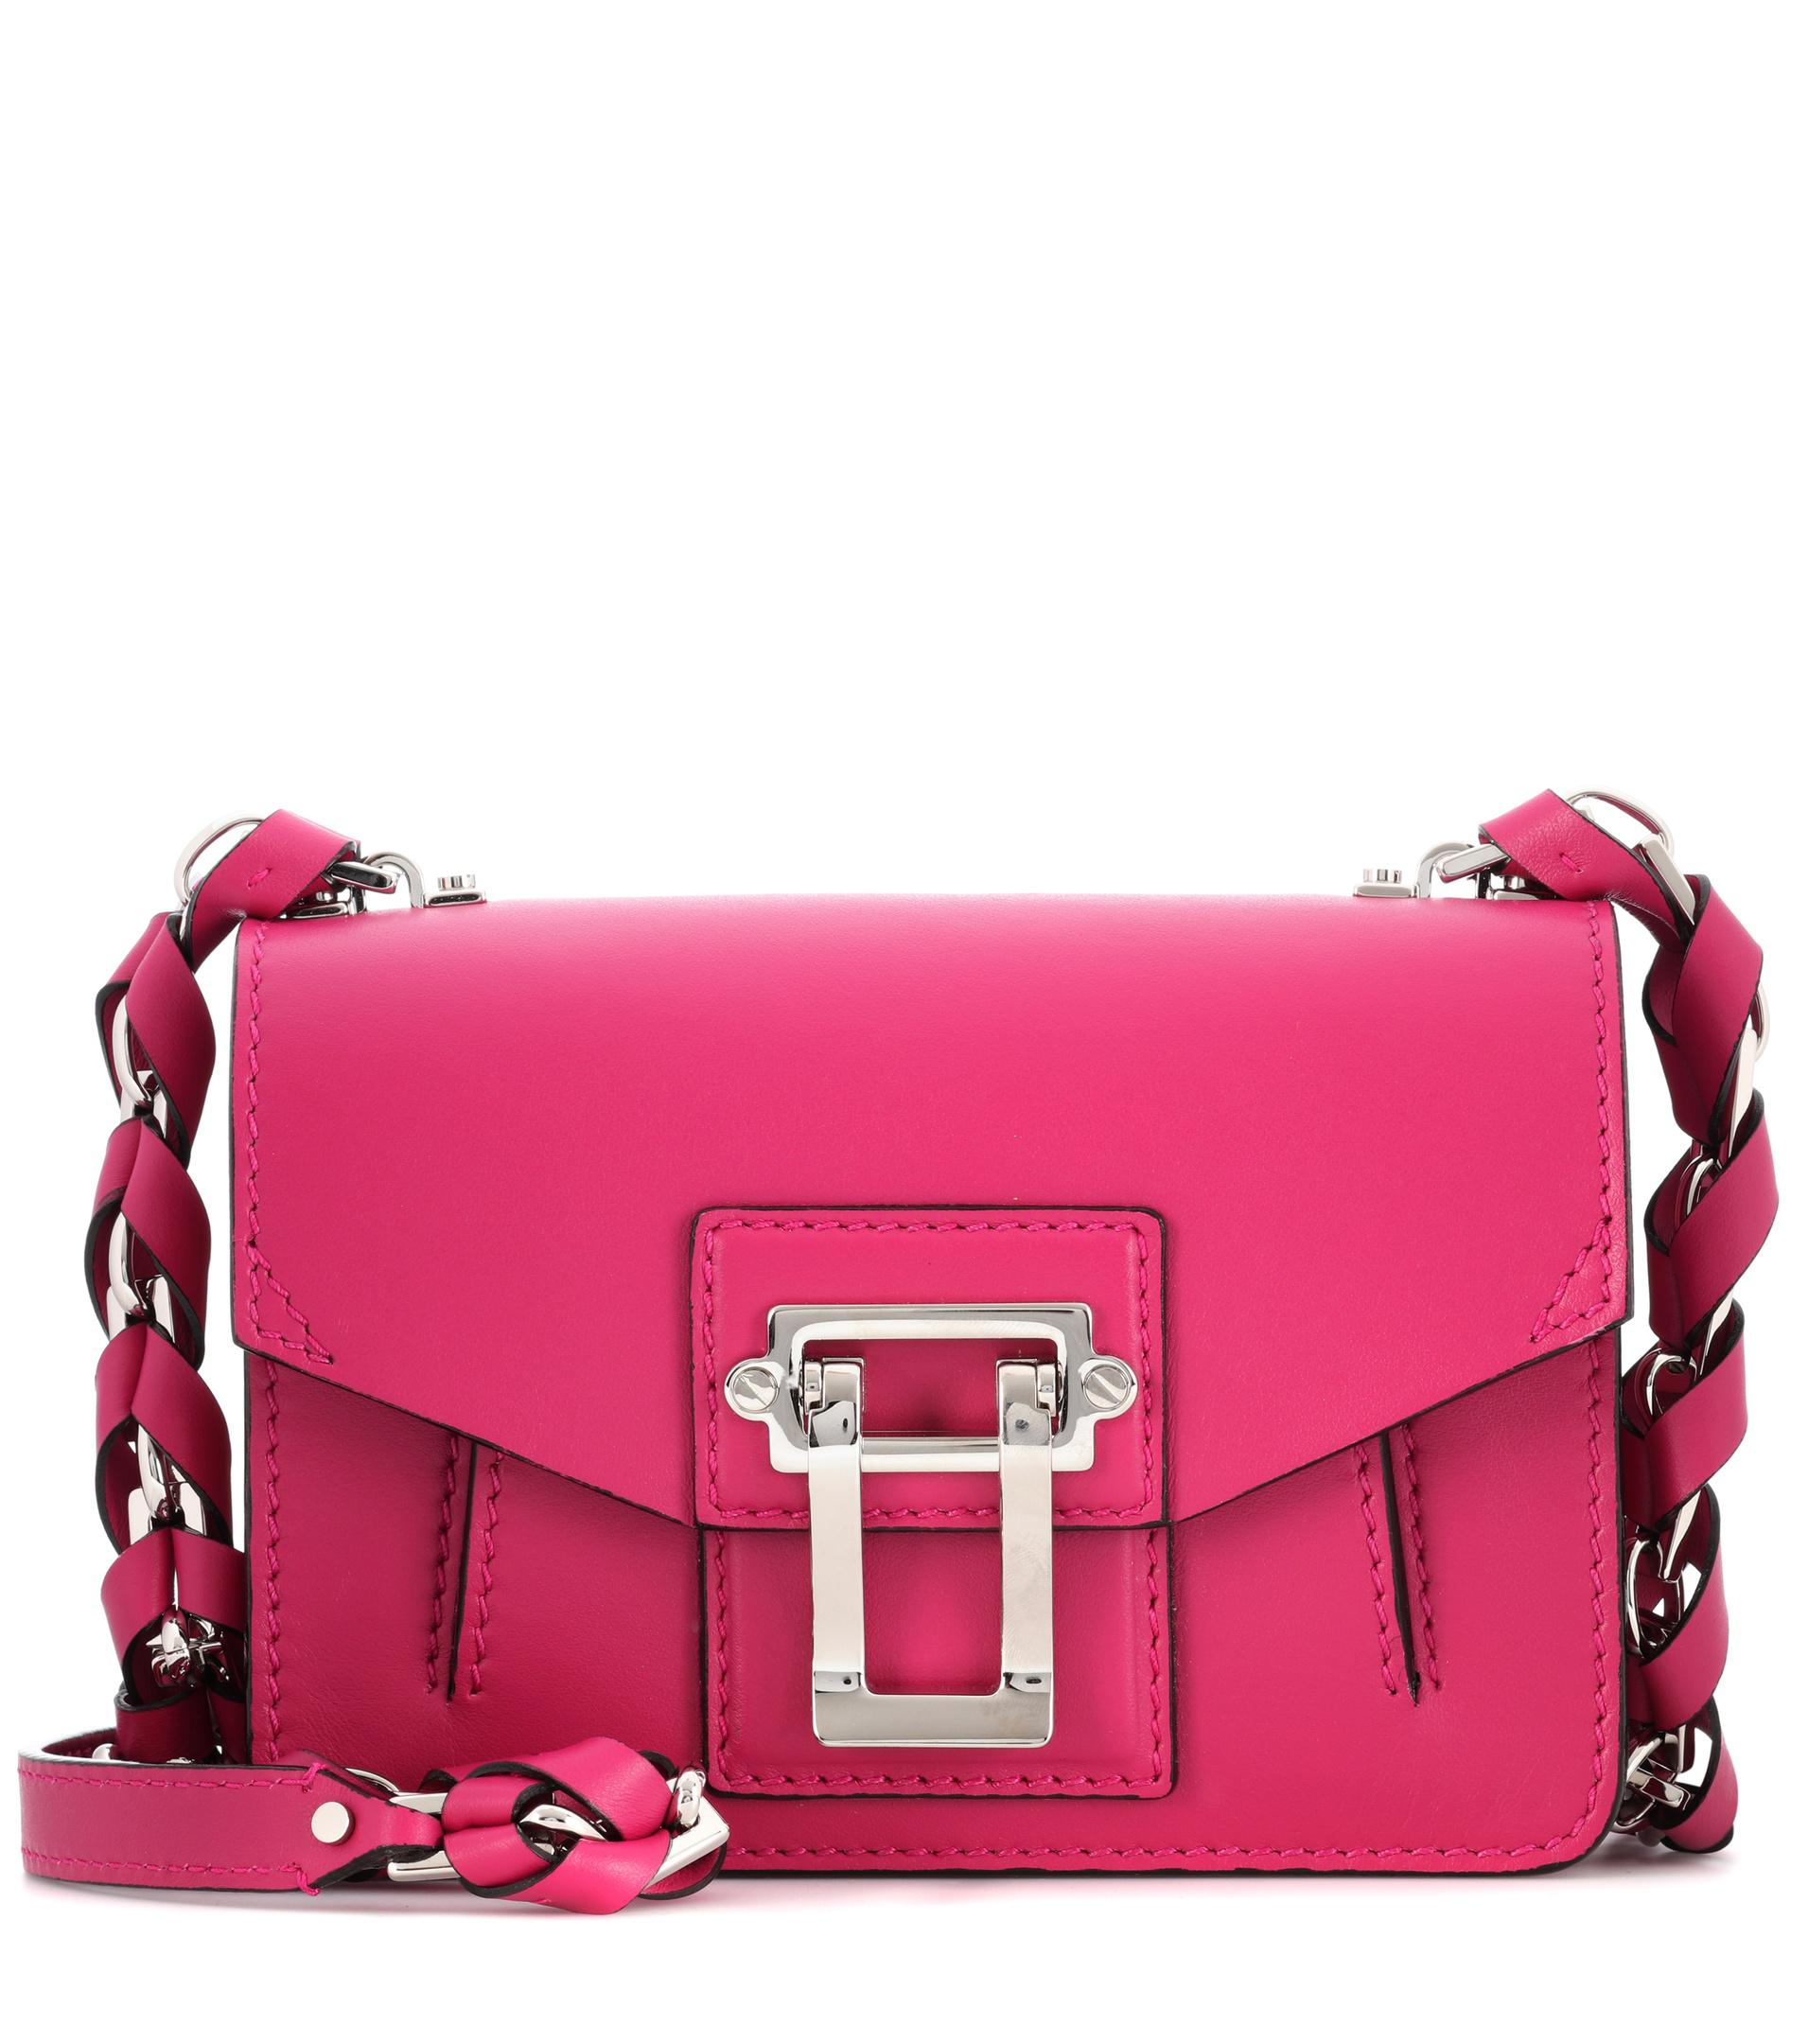 327561c5ffdb proenza-schouler-pink-Hava-Chain-Leather-Shoulder-Bag.jpeg